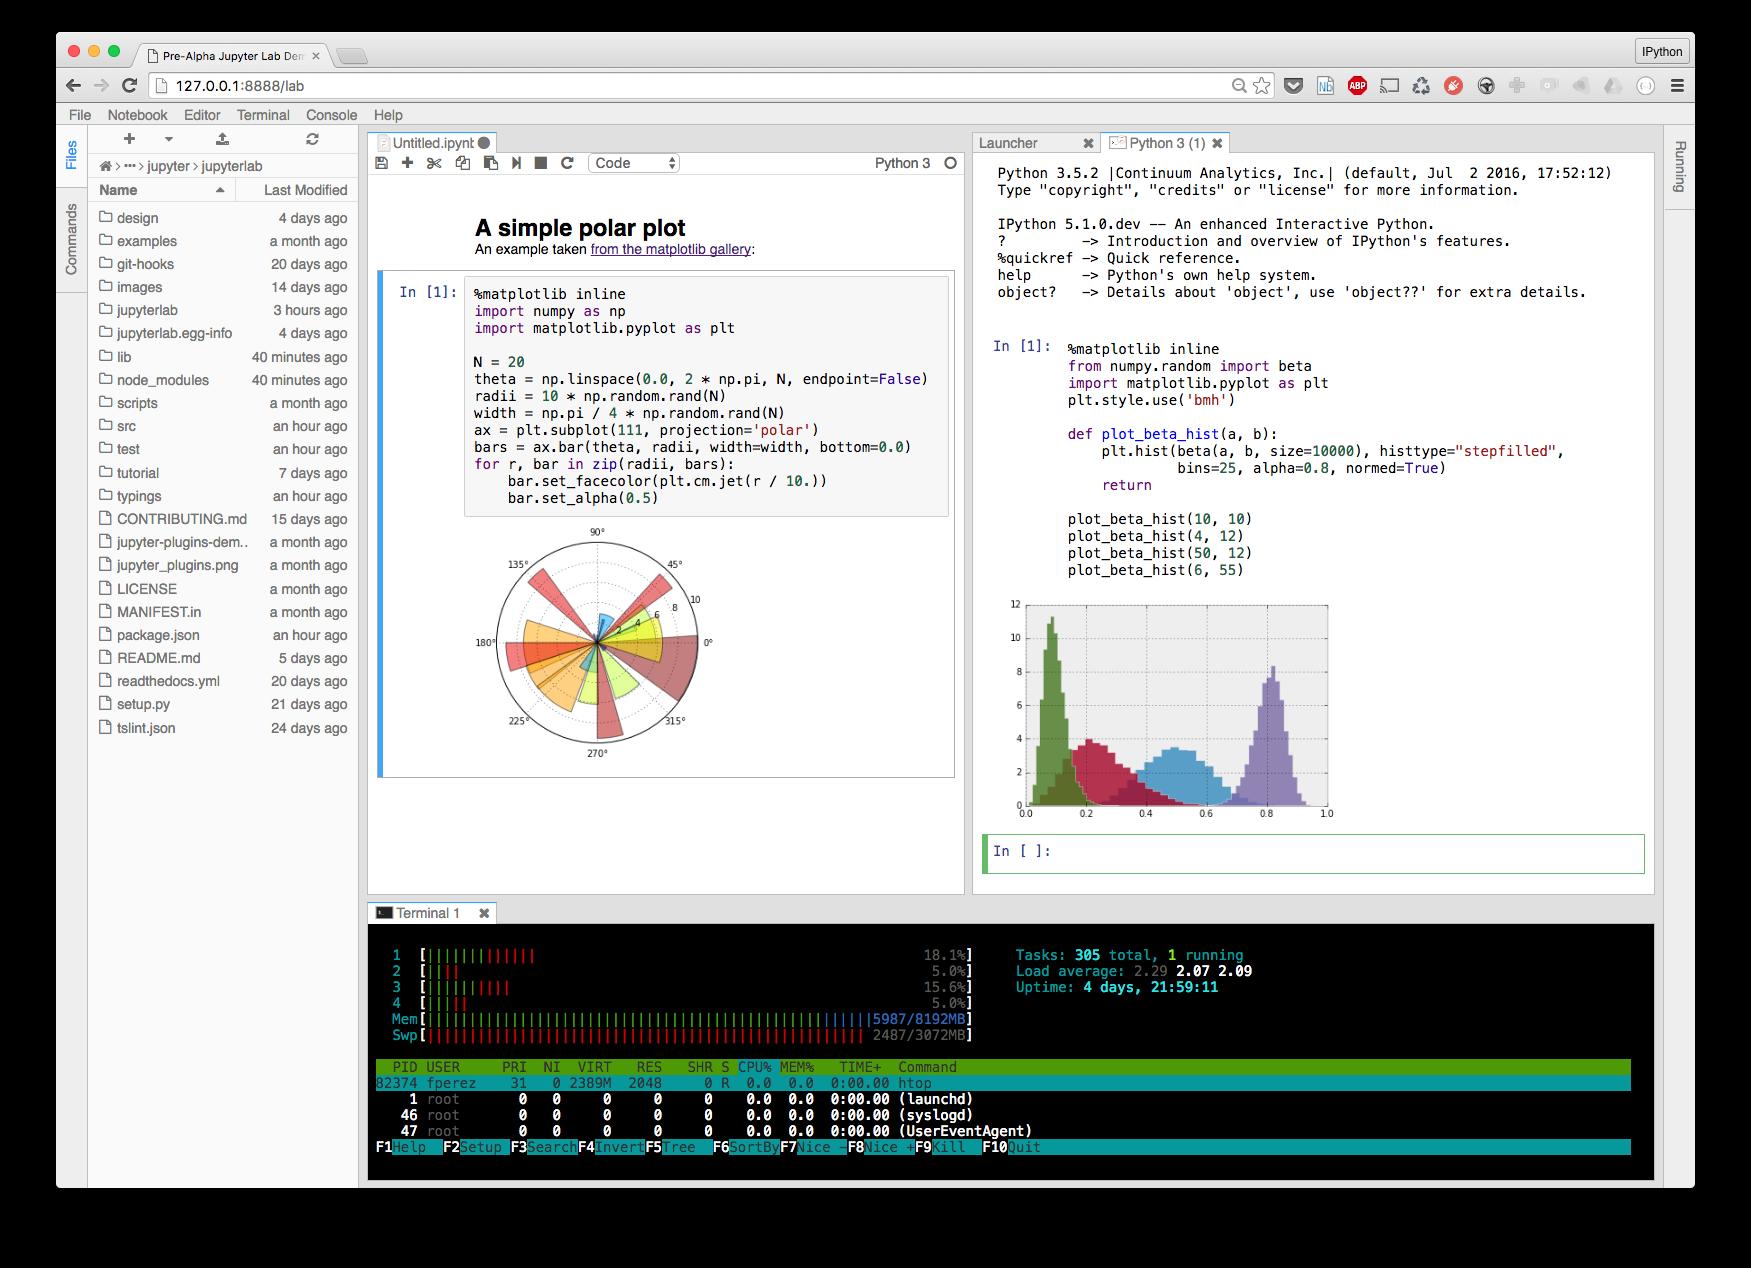 JupyterLab MacOSX + Anaconda で matplotlib のインライン表示ができない!解決方法 / How to use matplotlib inline with JupyterLab in MacOSX and Anaconda